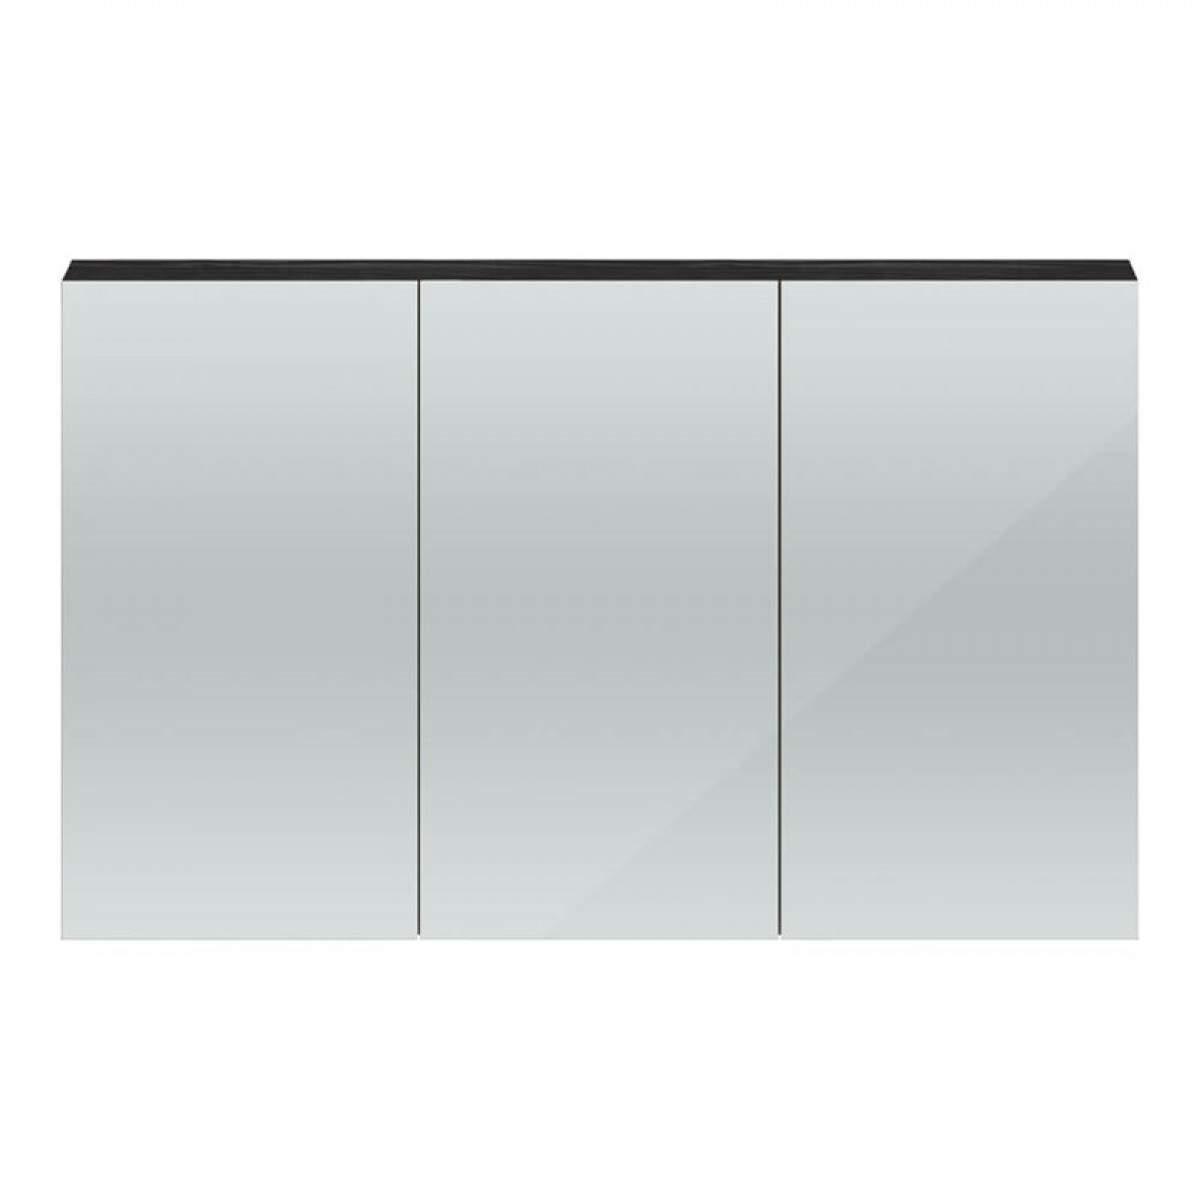 https://www.mepstock.co.uk/admin/images/hudson-reed-modular-bathroom-cabinet-QUA011_Mirror-cabinet_Black.jpg